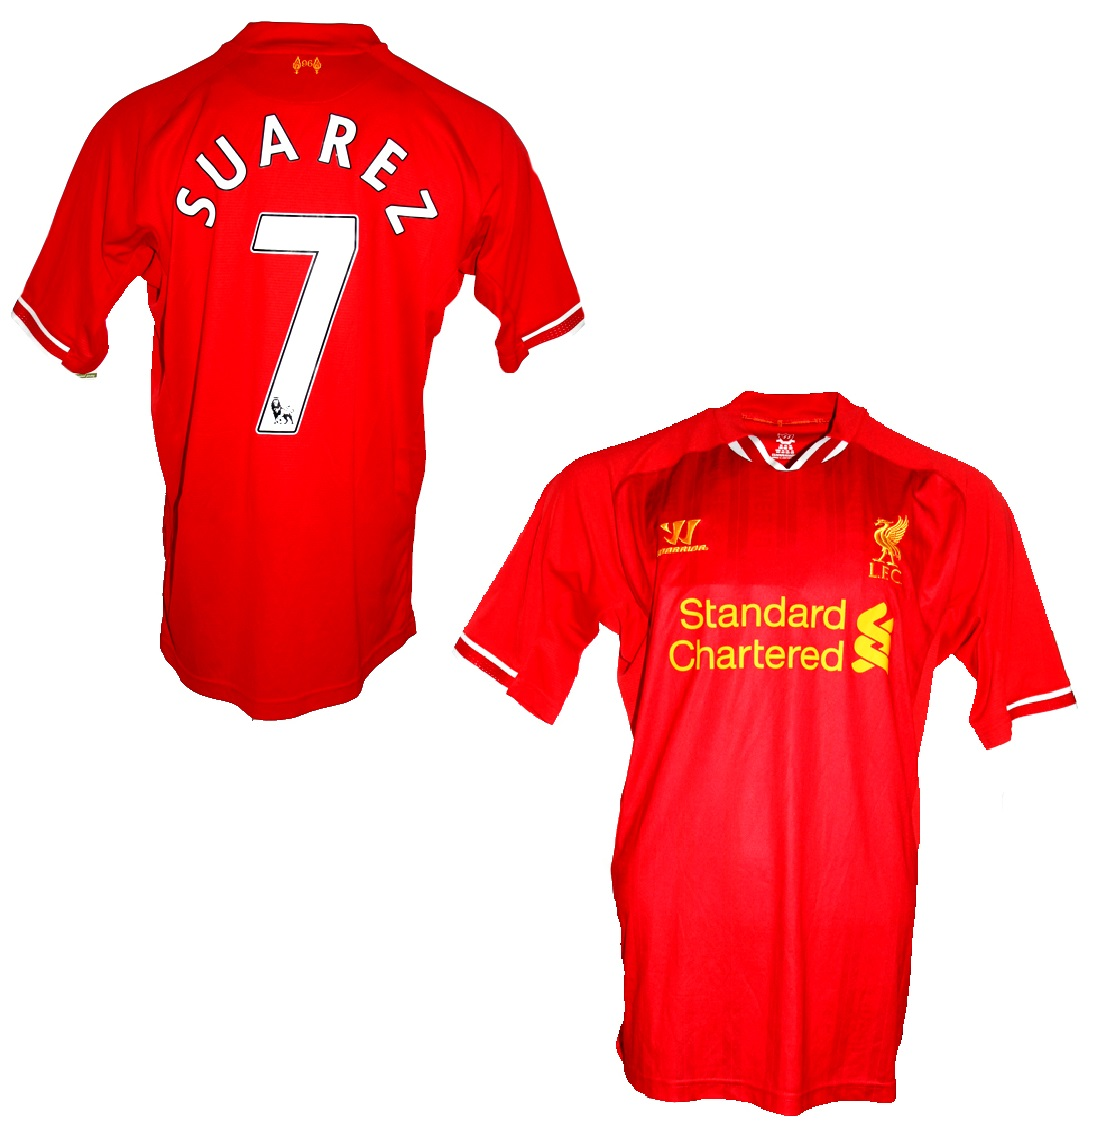 finest selection 07b70 c3731 Warrior FC Liverpool jersey 7 Luis Suárez 2013/14 home red ...